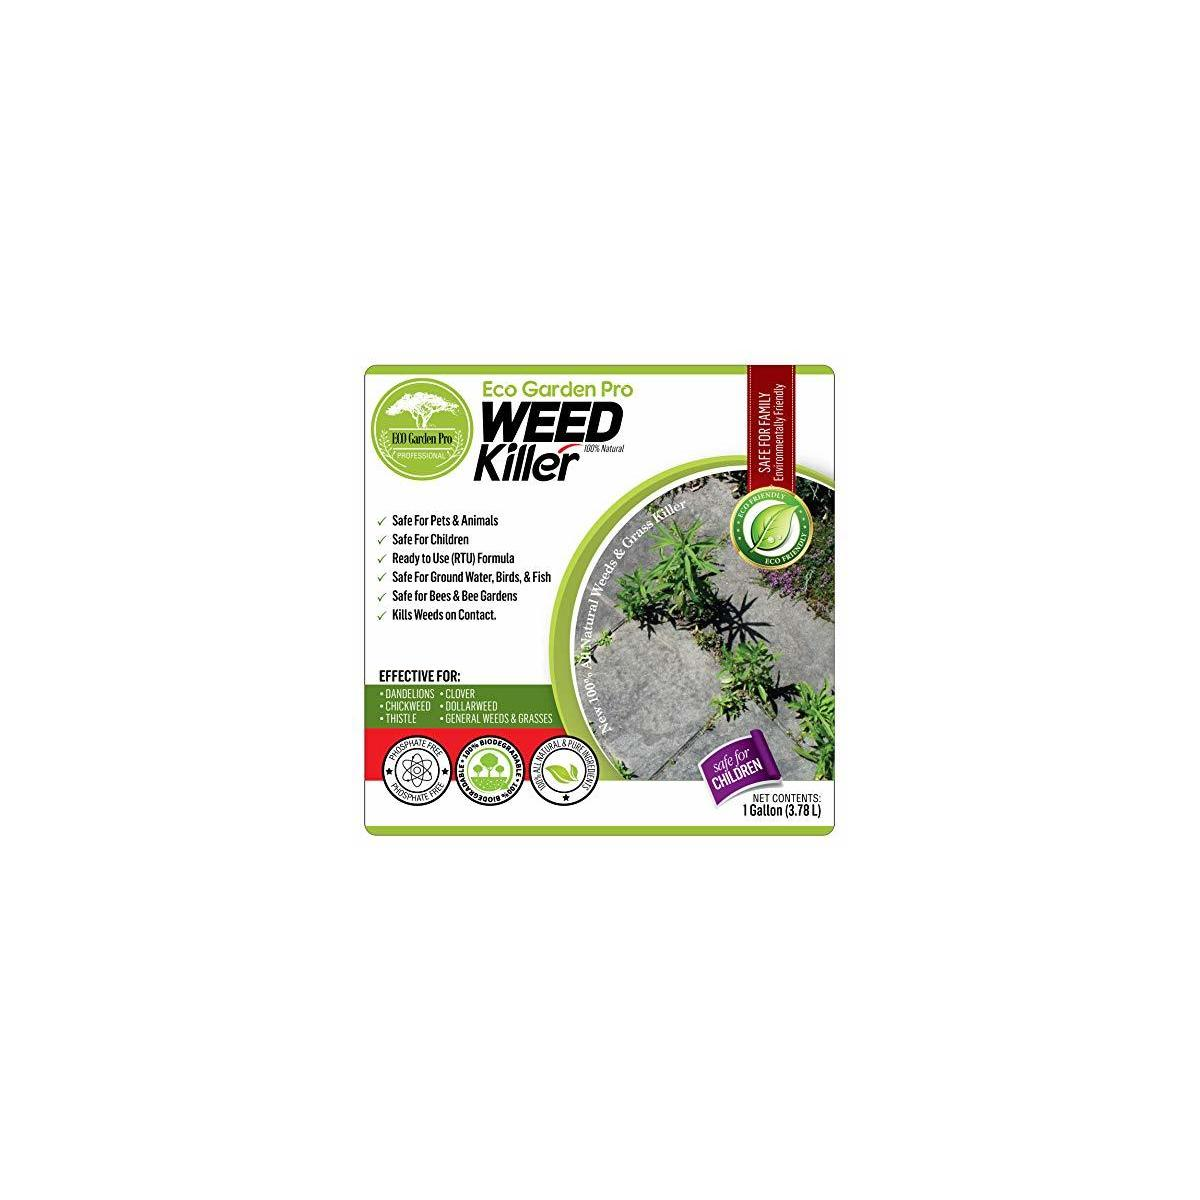 ECO Garden PRO - Organic Vinegar Weed Killer | Kid Safe Pet Safe | Clover Killer for Lawns | Moss Killer | Green Grass & Poison Ivy Killer | Spray Ready Glyphosate Free Herbicide (1 Gallon)… B07TSHB427